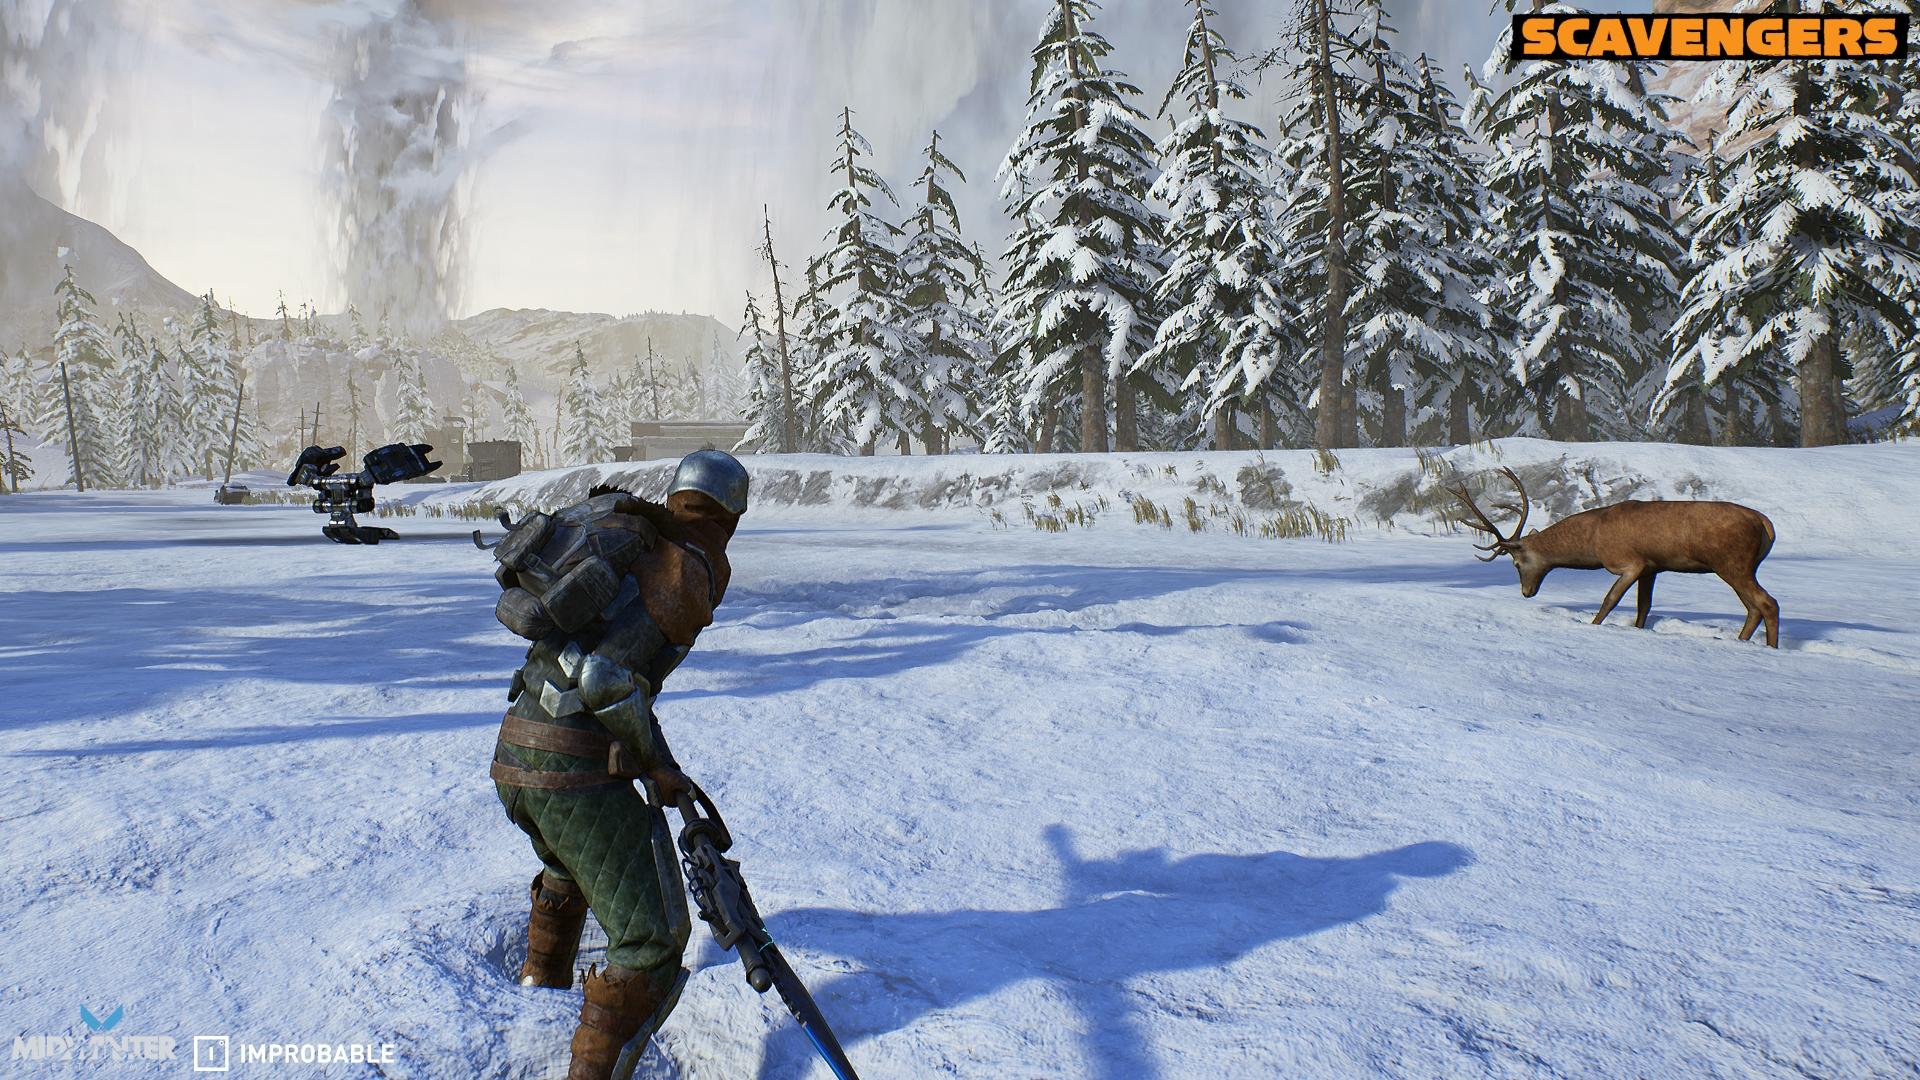 Scavengers E3 2019 screenshot 3